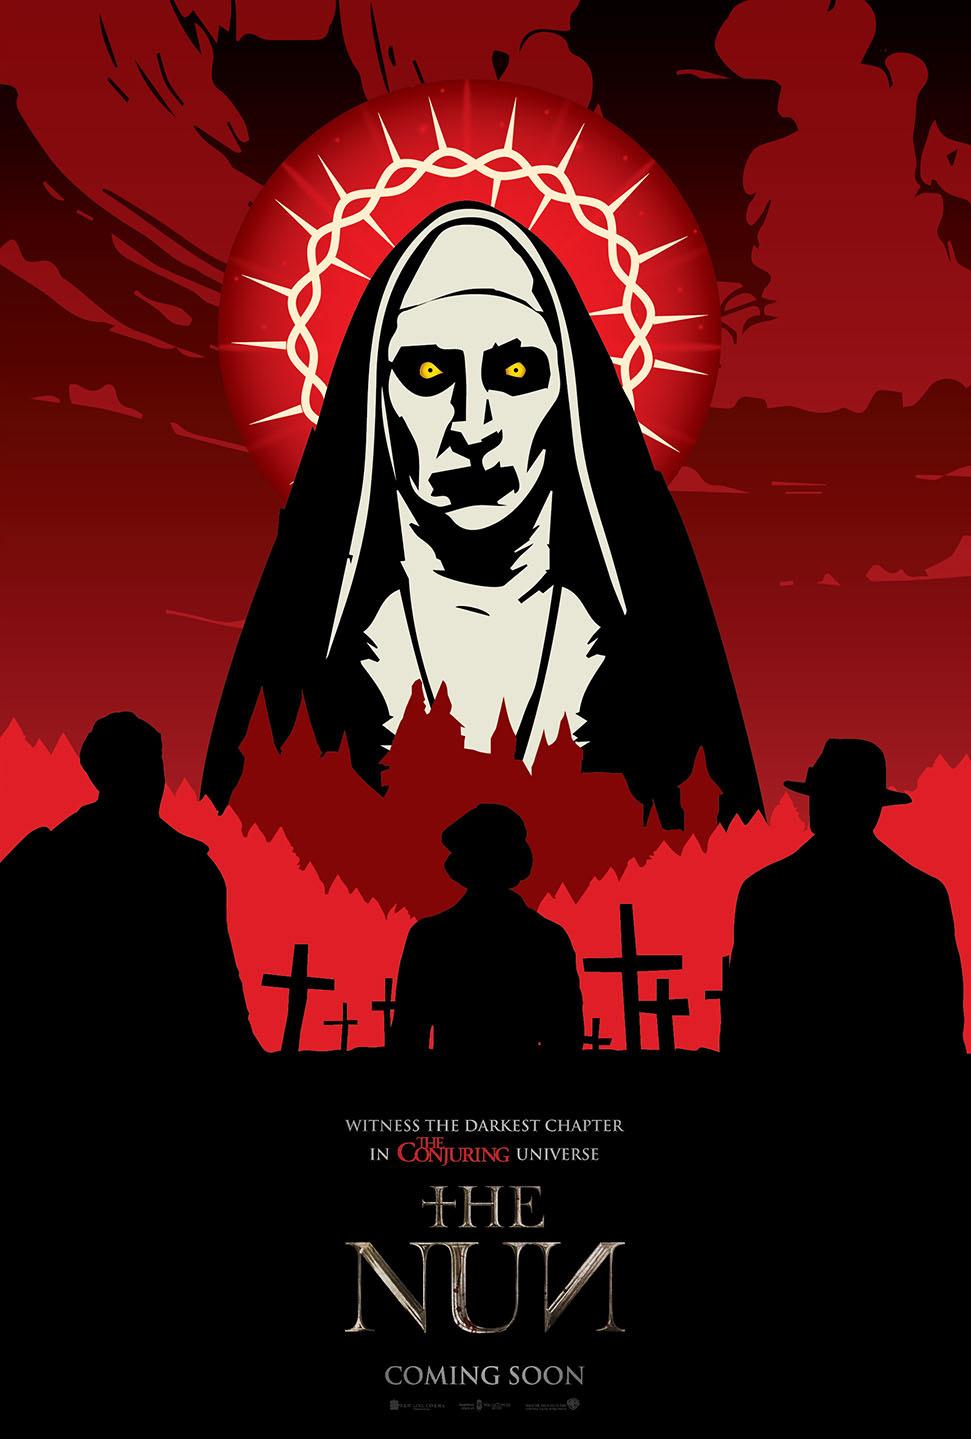 The Nun 2018 Alternative Movie Poster On Behance